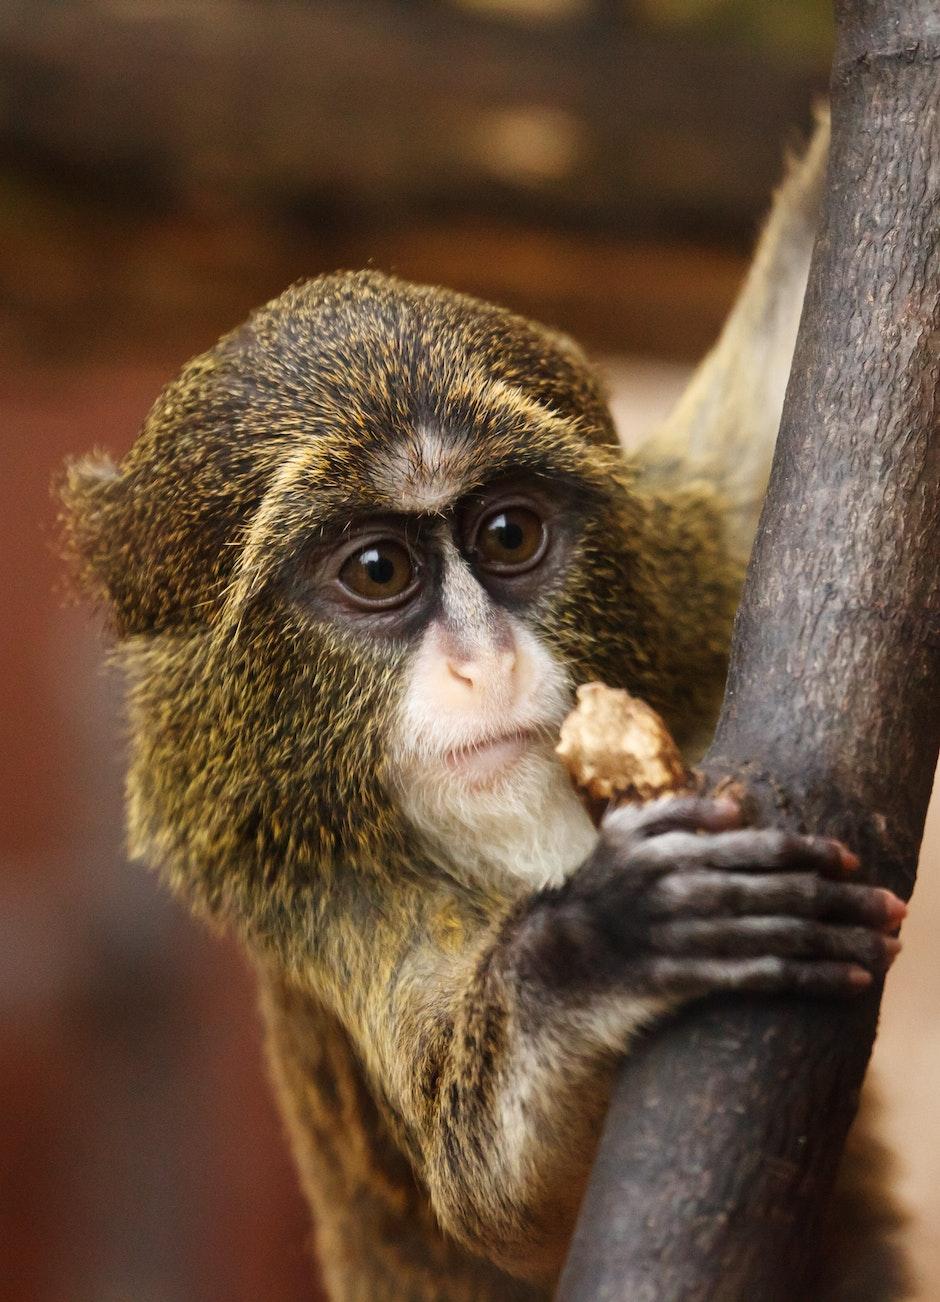 Brown and Black Monkey Handing Brown Fruit during Daytime